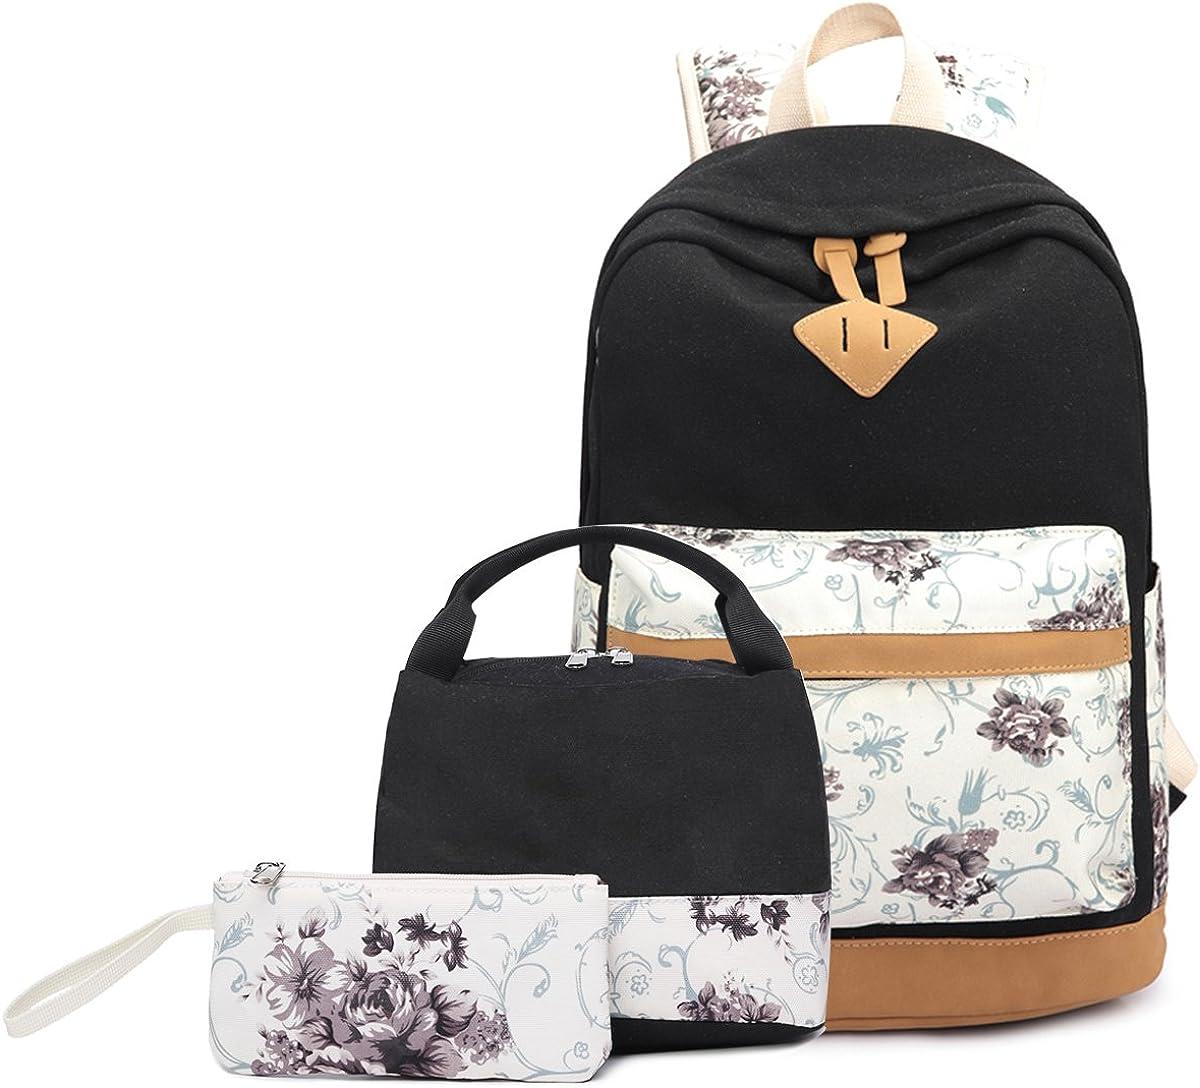 FLYMEI Backpack for Women, 15.6 Inch Laptop Backpack, Cute Bookbags for School